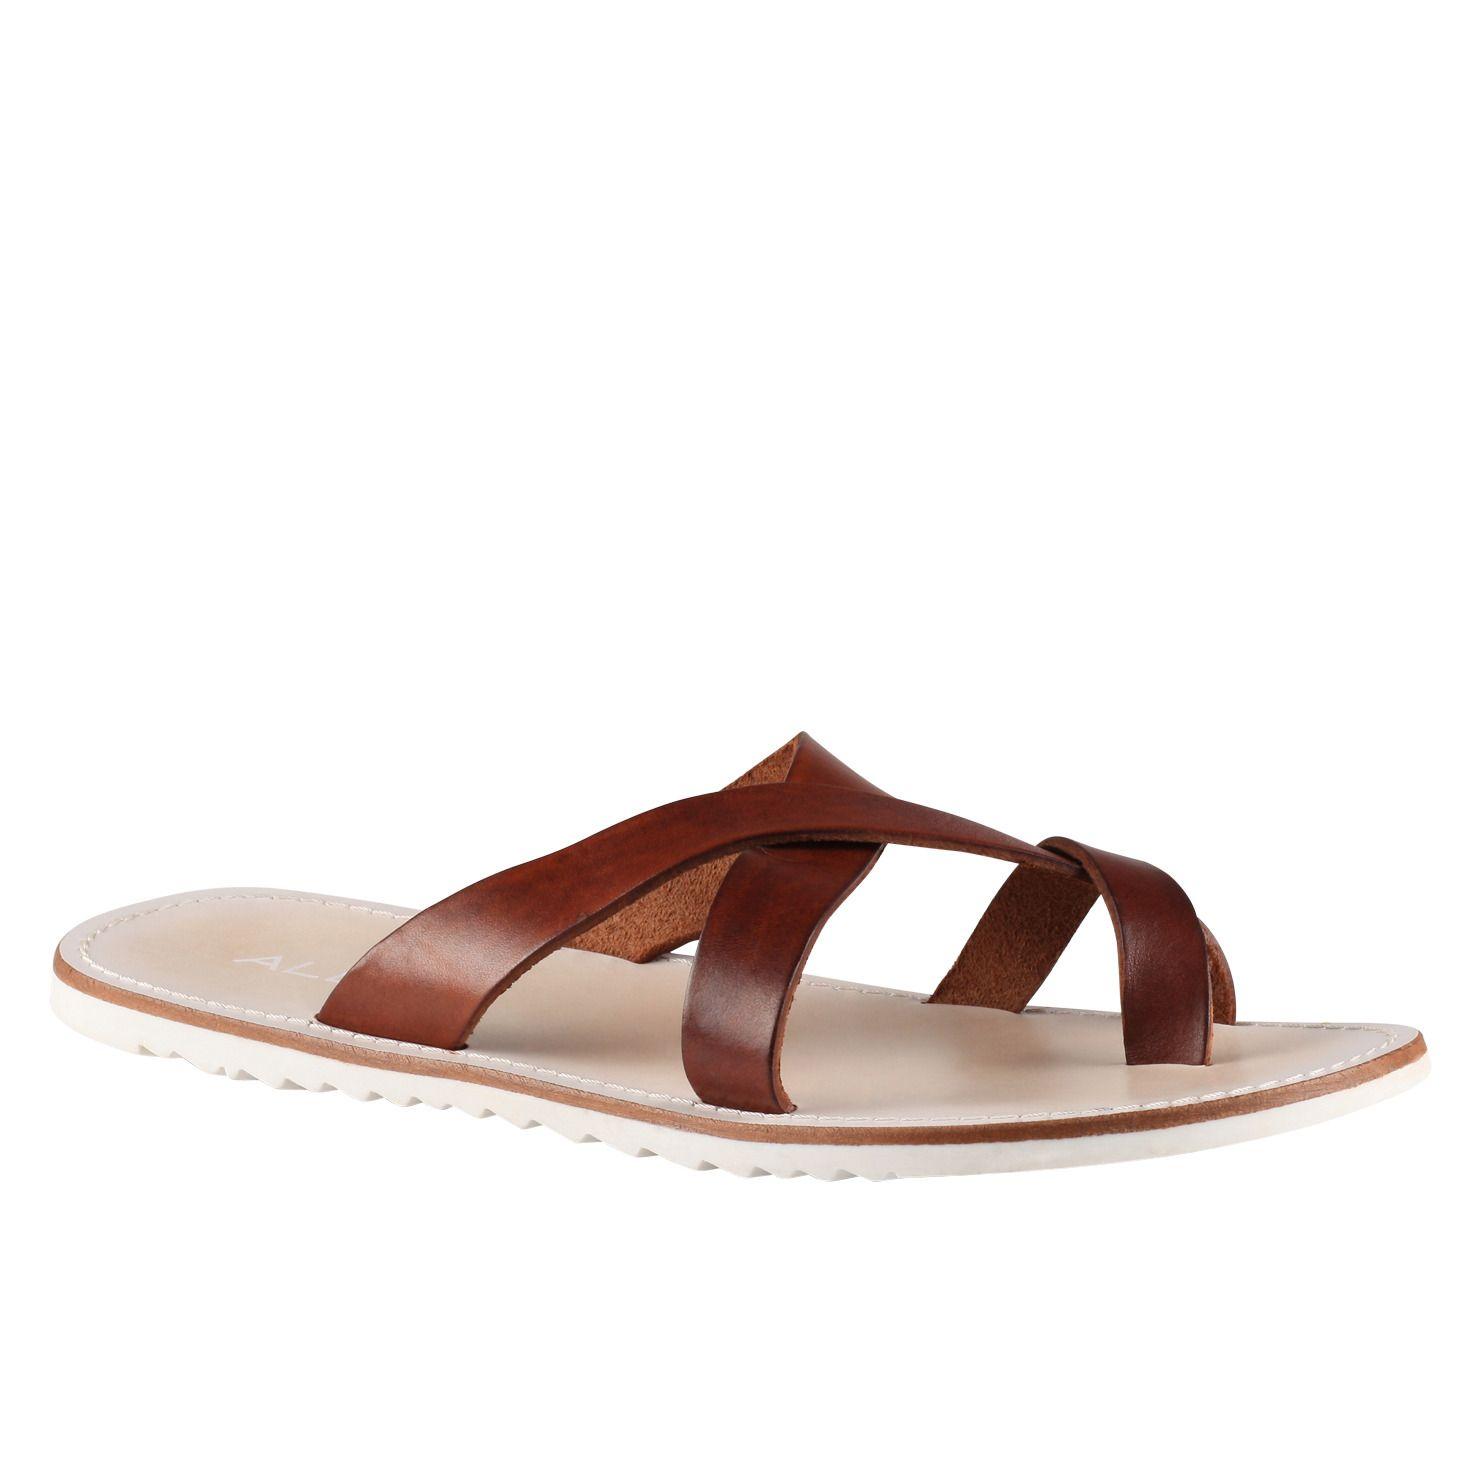 leather sandals, Mens fashion shoes